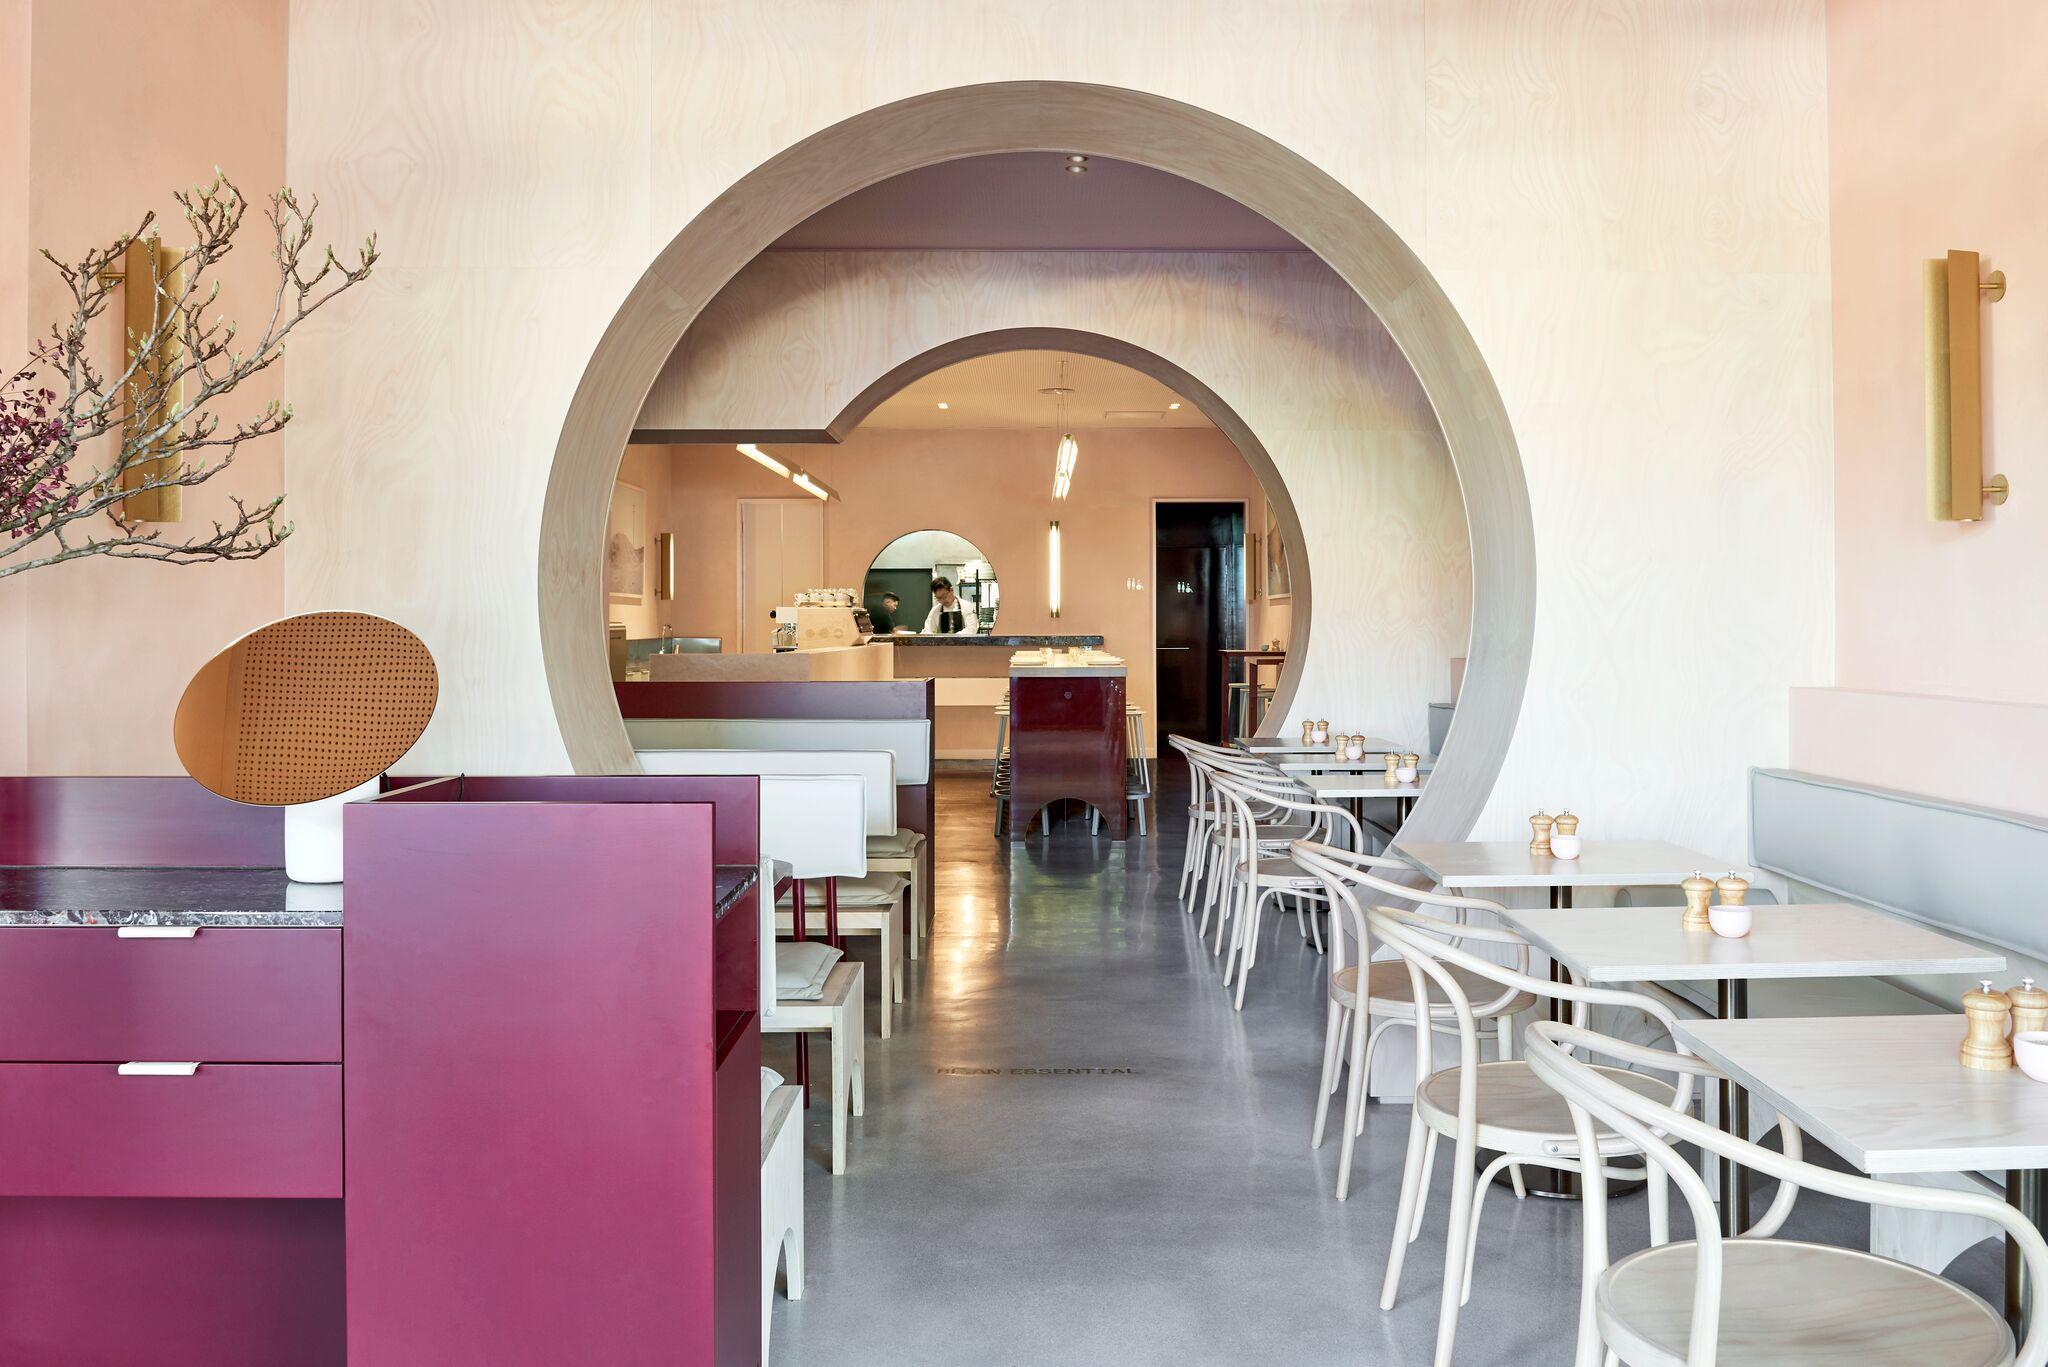 Workshop Bros - Glen Waverley - Interior - Food Win Design - Image 3